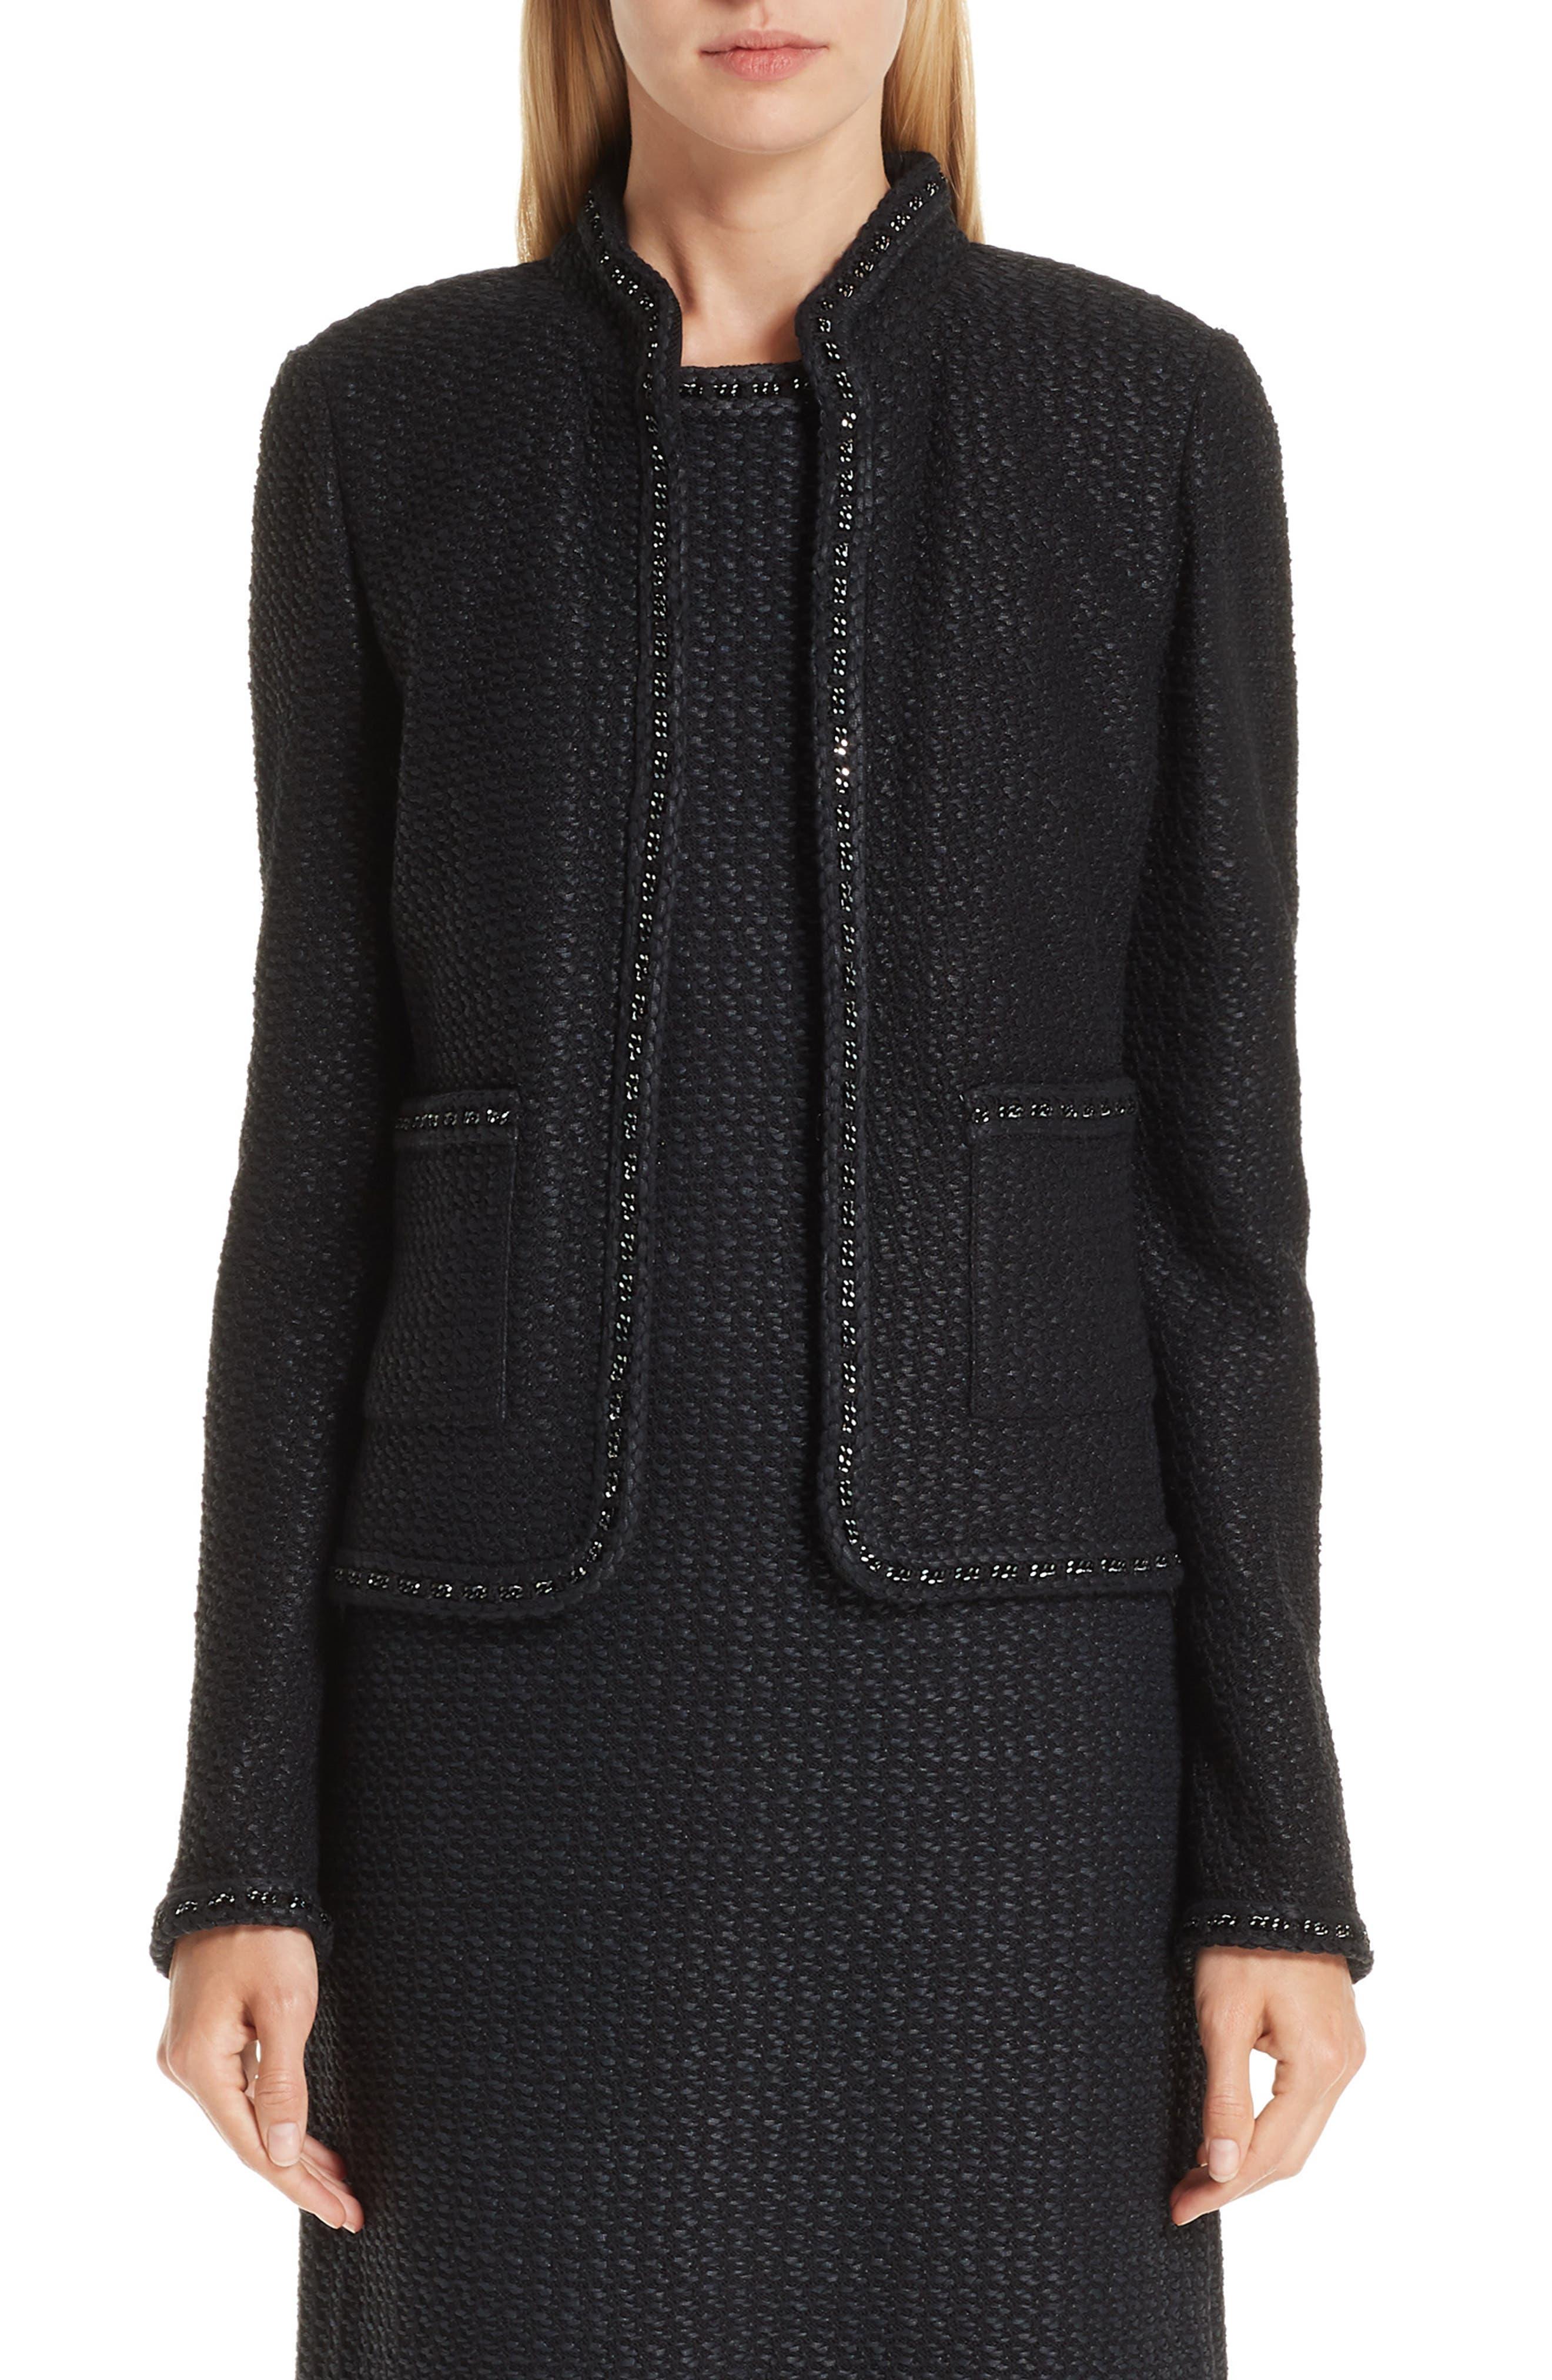 ST. JOHN COLLECTION Adina Knit Short Jacket, Main, color, CAVIAR